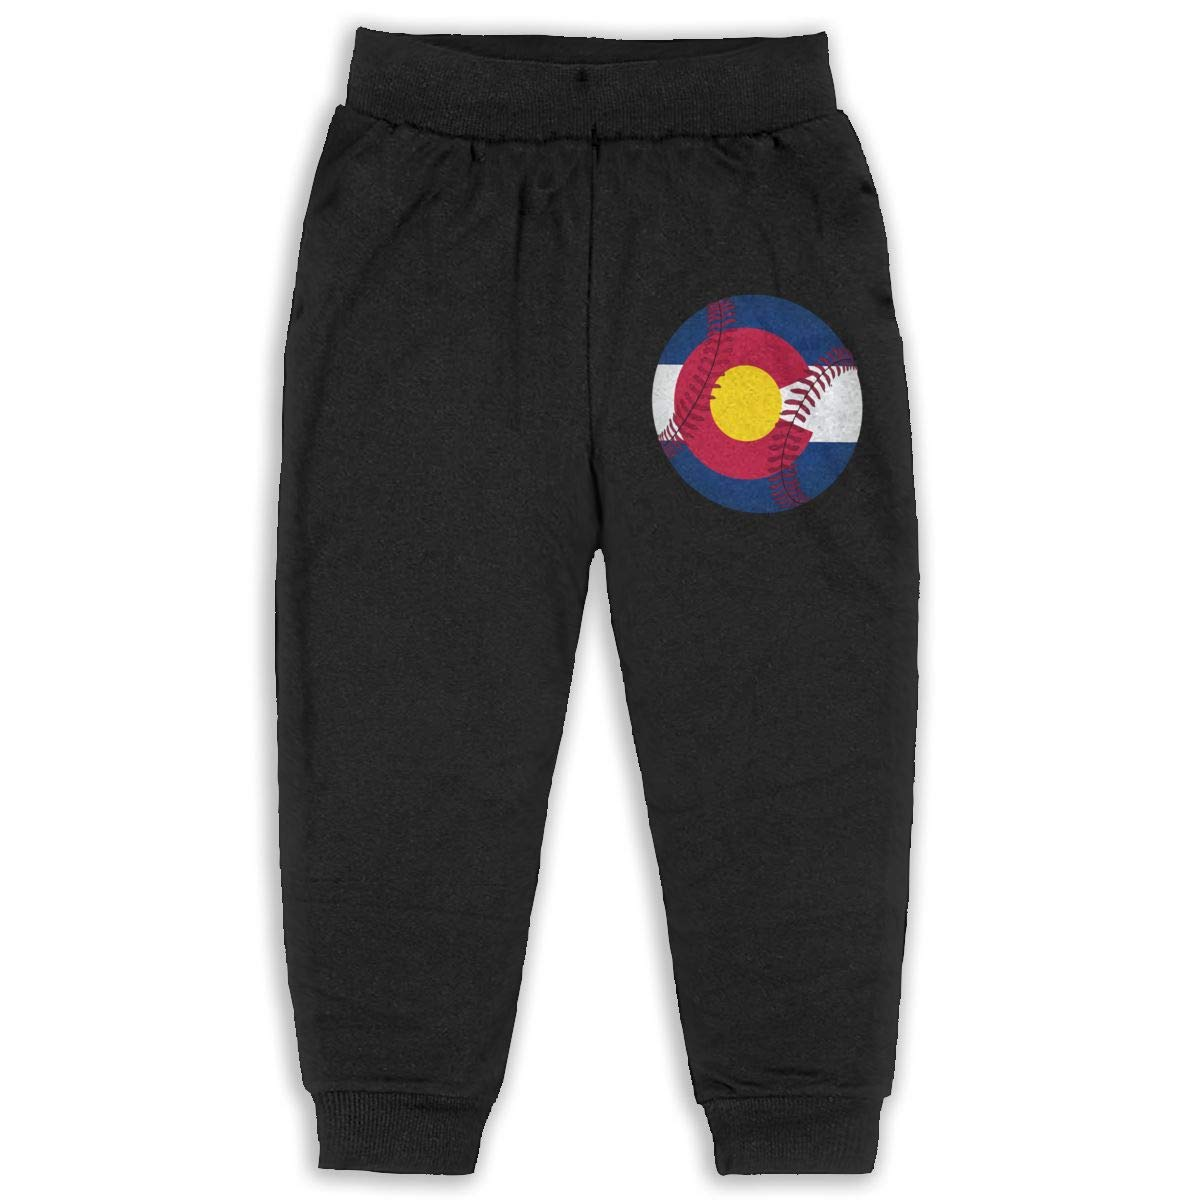 Cqelng Oii Funny Colorado Baseball 2-6T Boys Active Joggers Soft Sweatpants